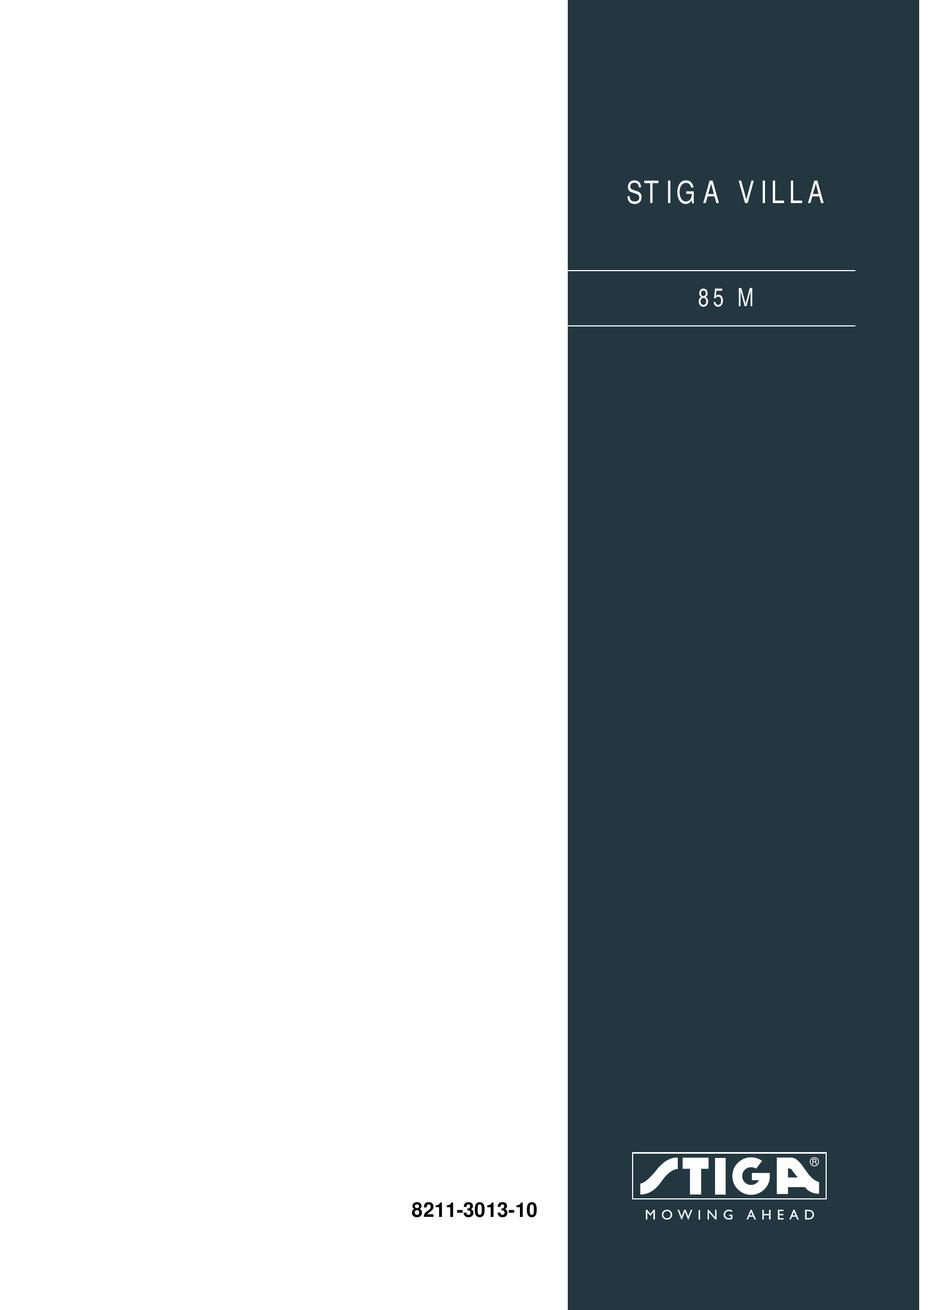 Villa 85 M Messerklingen-Satz pas f Park 121 M Villa II 85 Stiga Park 102 M